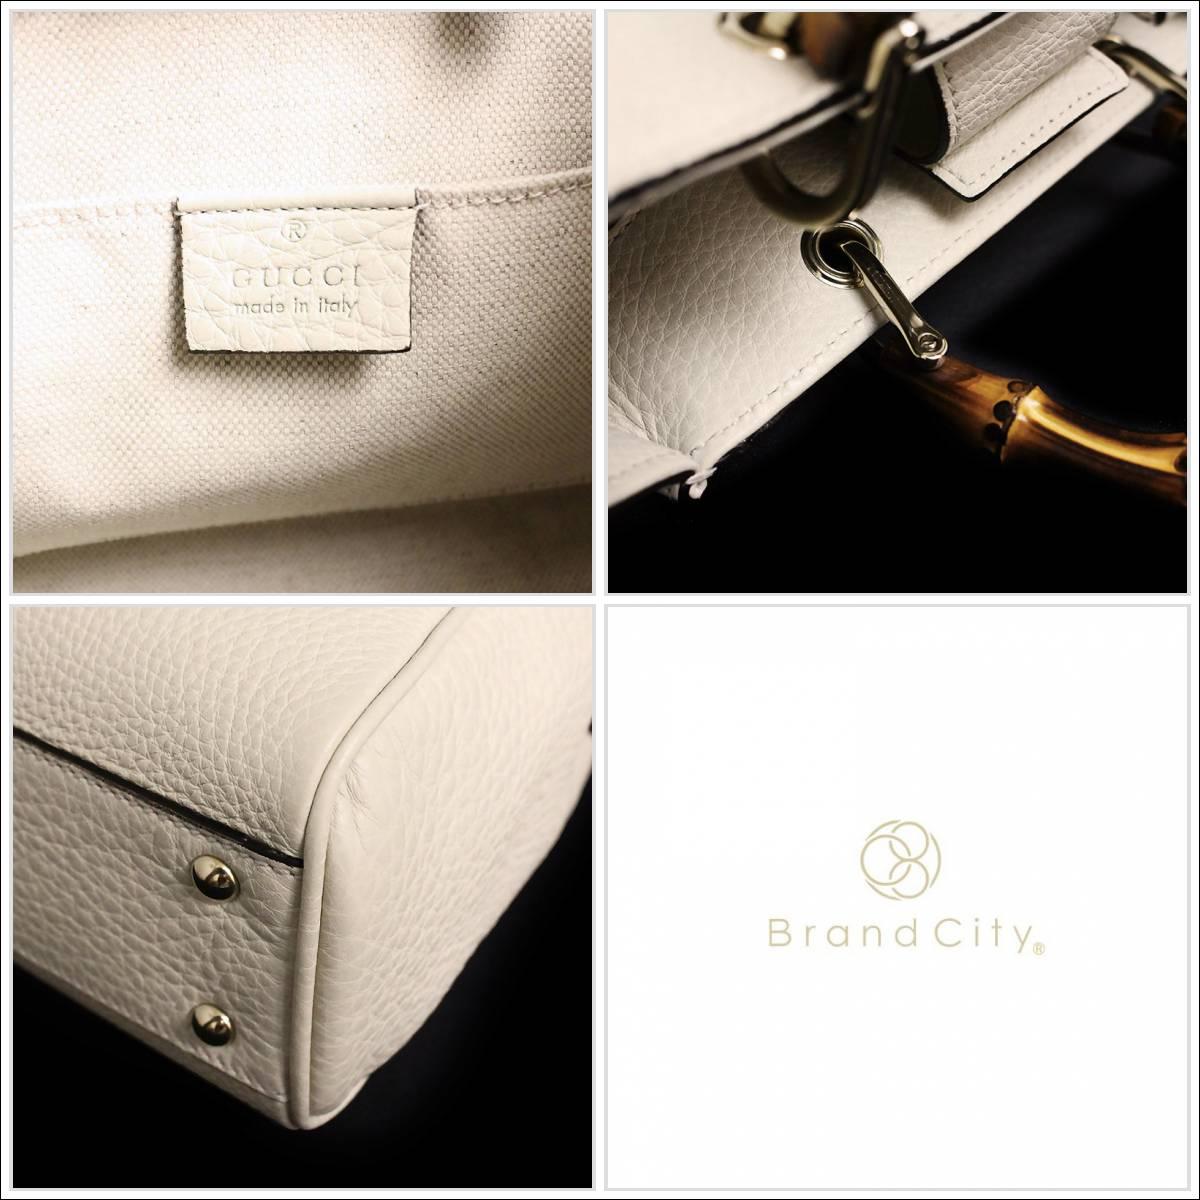 8cbd812c9 ... Gucci bamboo shopper mini-steering wheel bag 368823 tassel charm  off-white belonging to